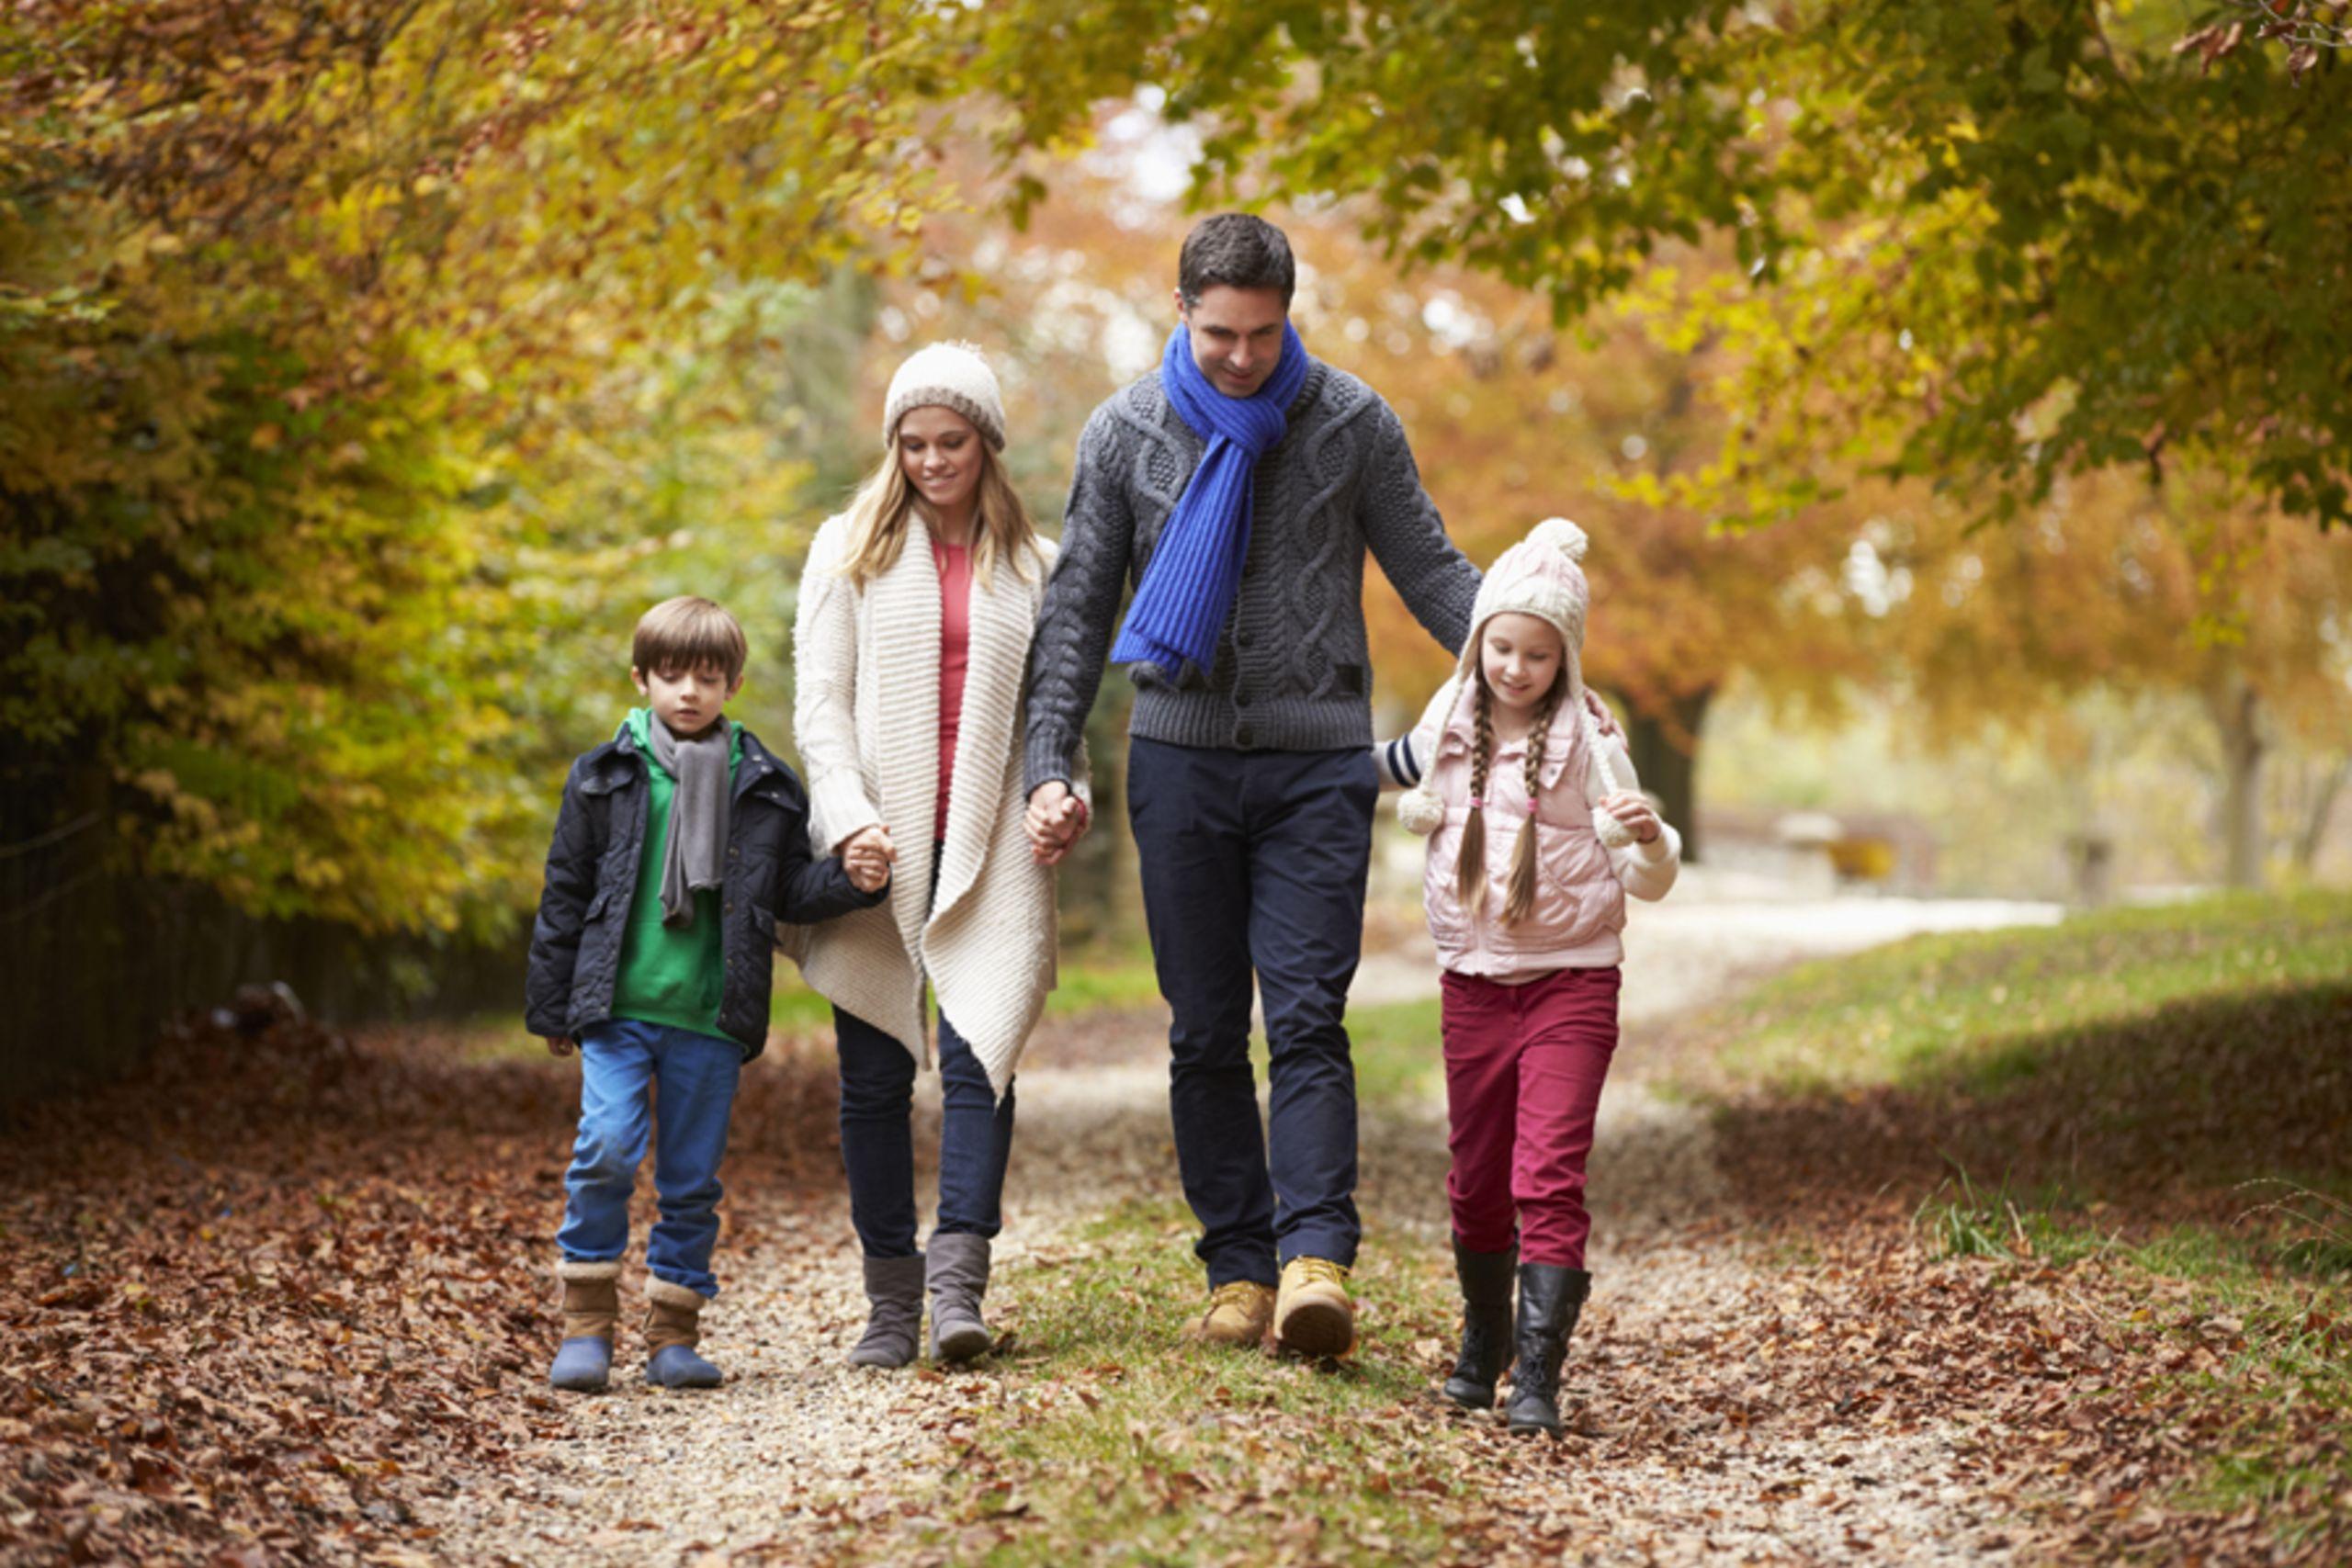 Neighborhood Parks and Great Settings